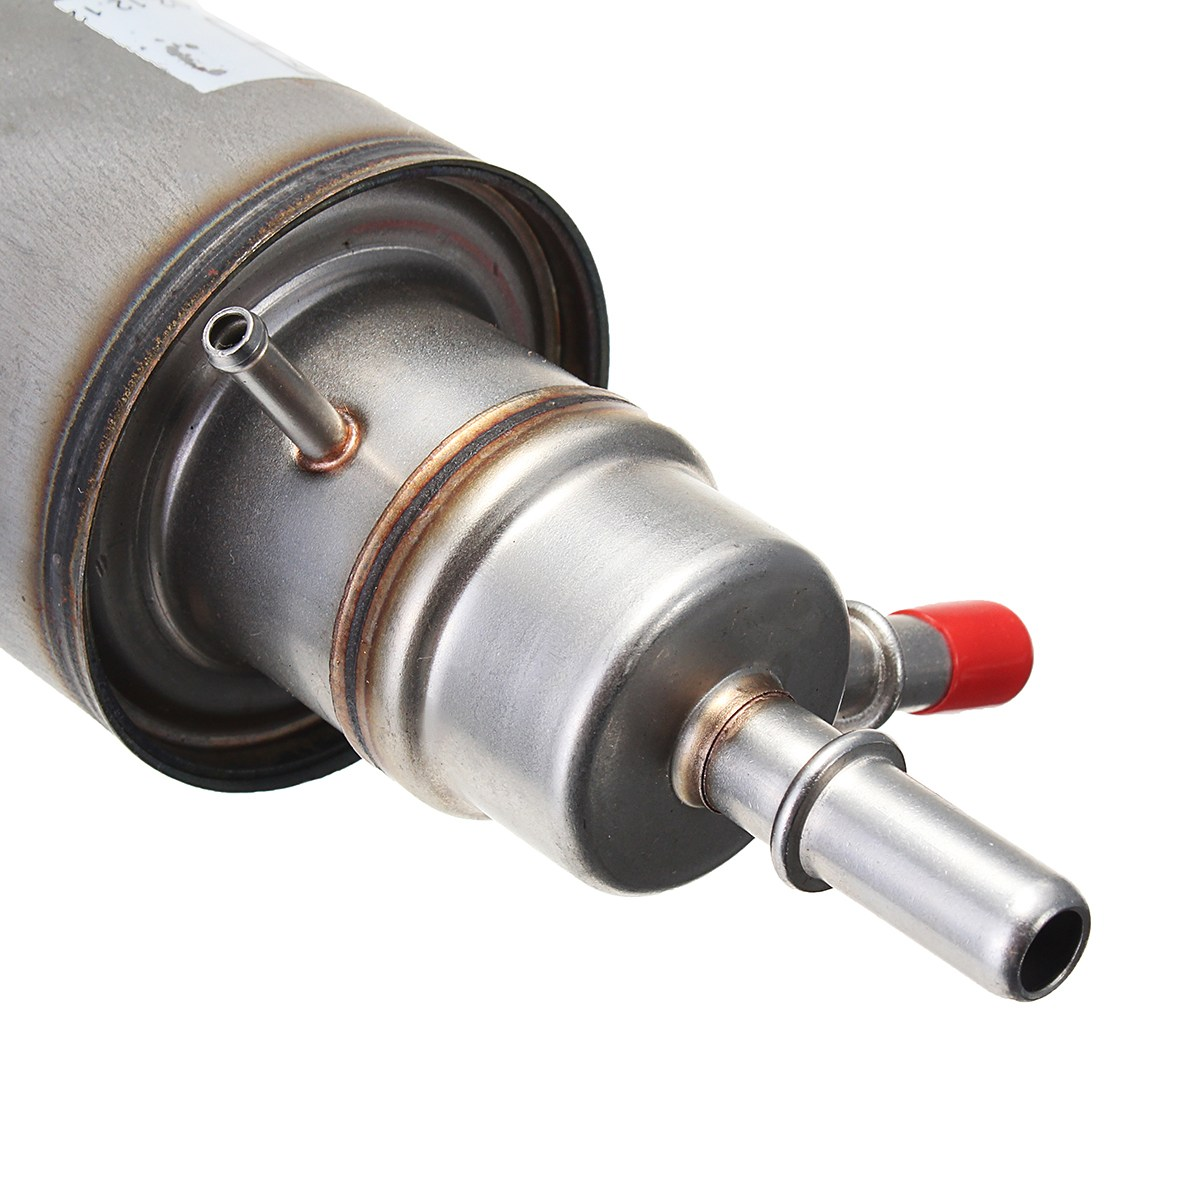 ml430 fuel filter wiring librarycar oil fuel filter pressure regulator for mercedes benz ml55 for amg [ 1200 x 1200 Pixel ]